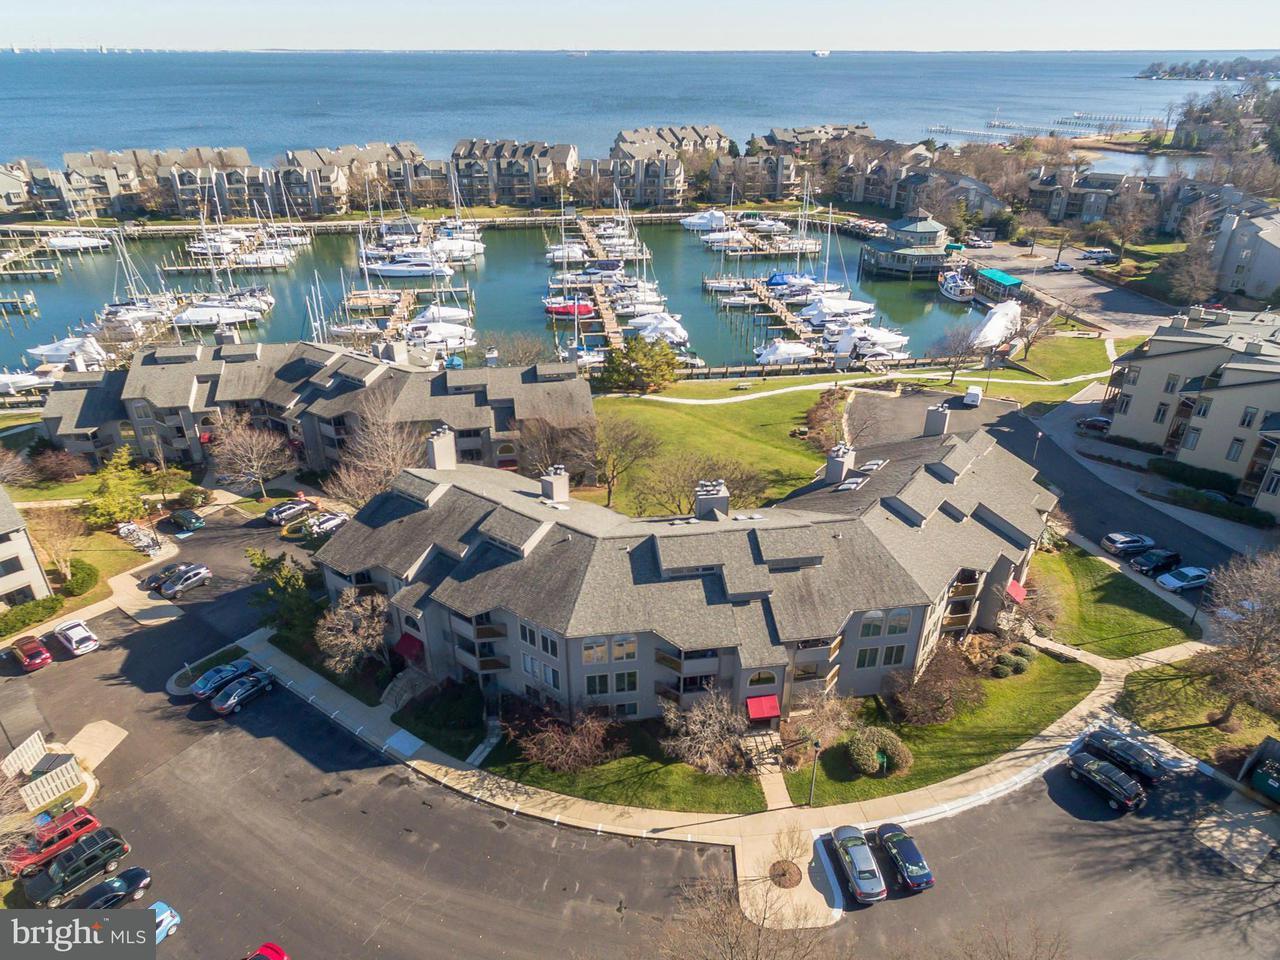 Condominium for Sale at 7048 HARBOUR VILLAGE CT #102 7048 HARBOUR VILLAGE CT #102 Annapolis, Maryland 21403 United States